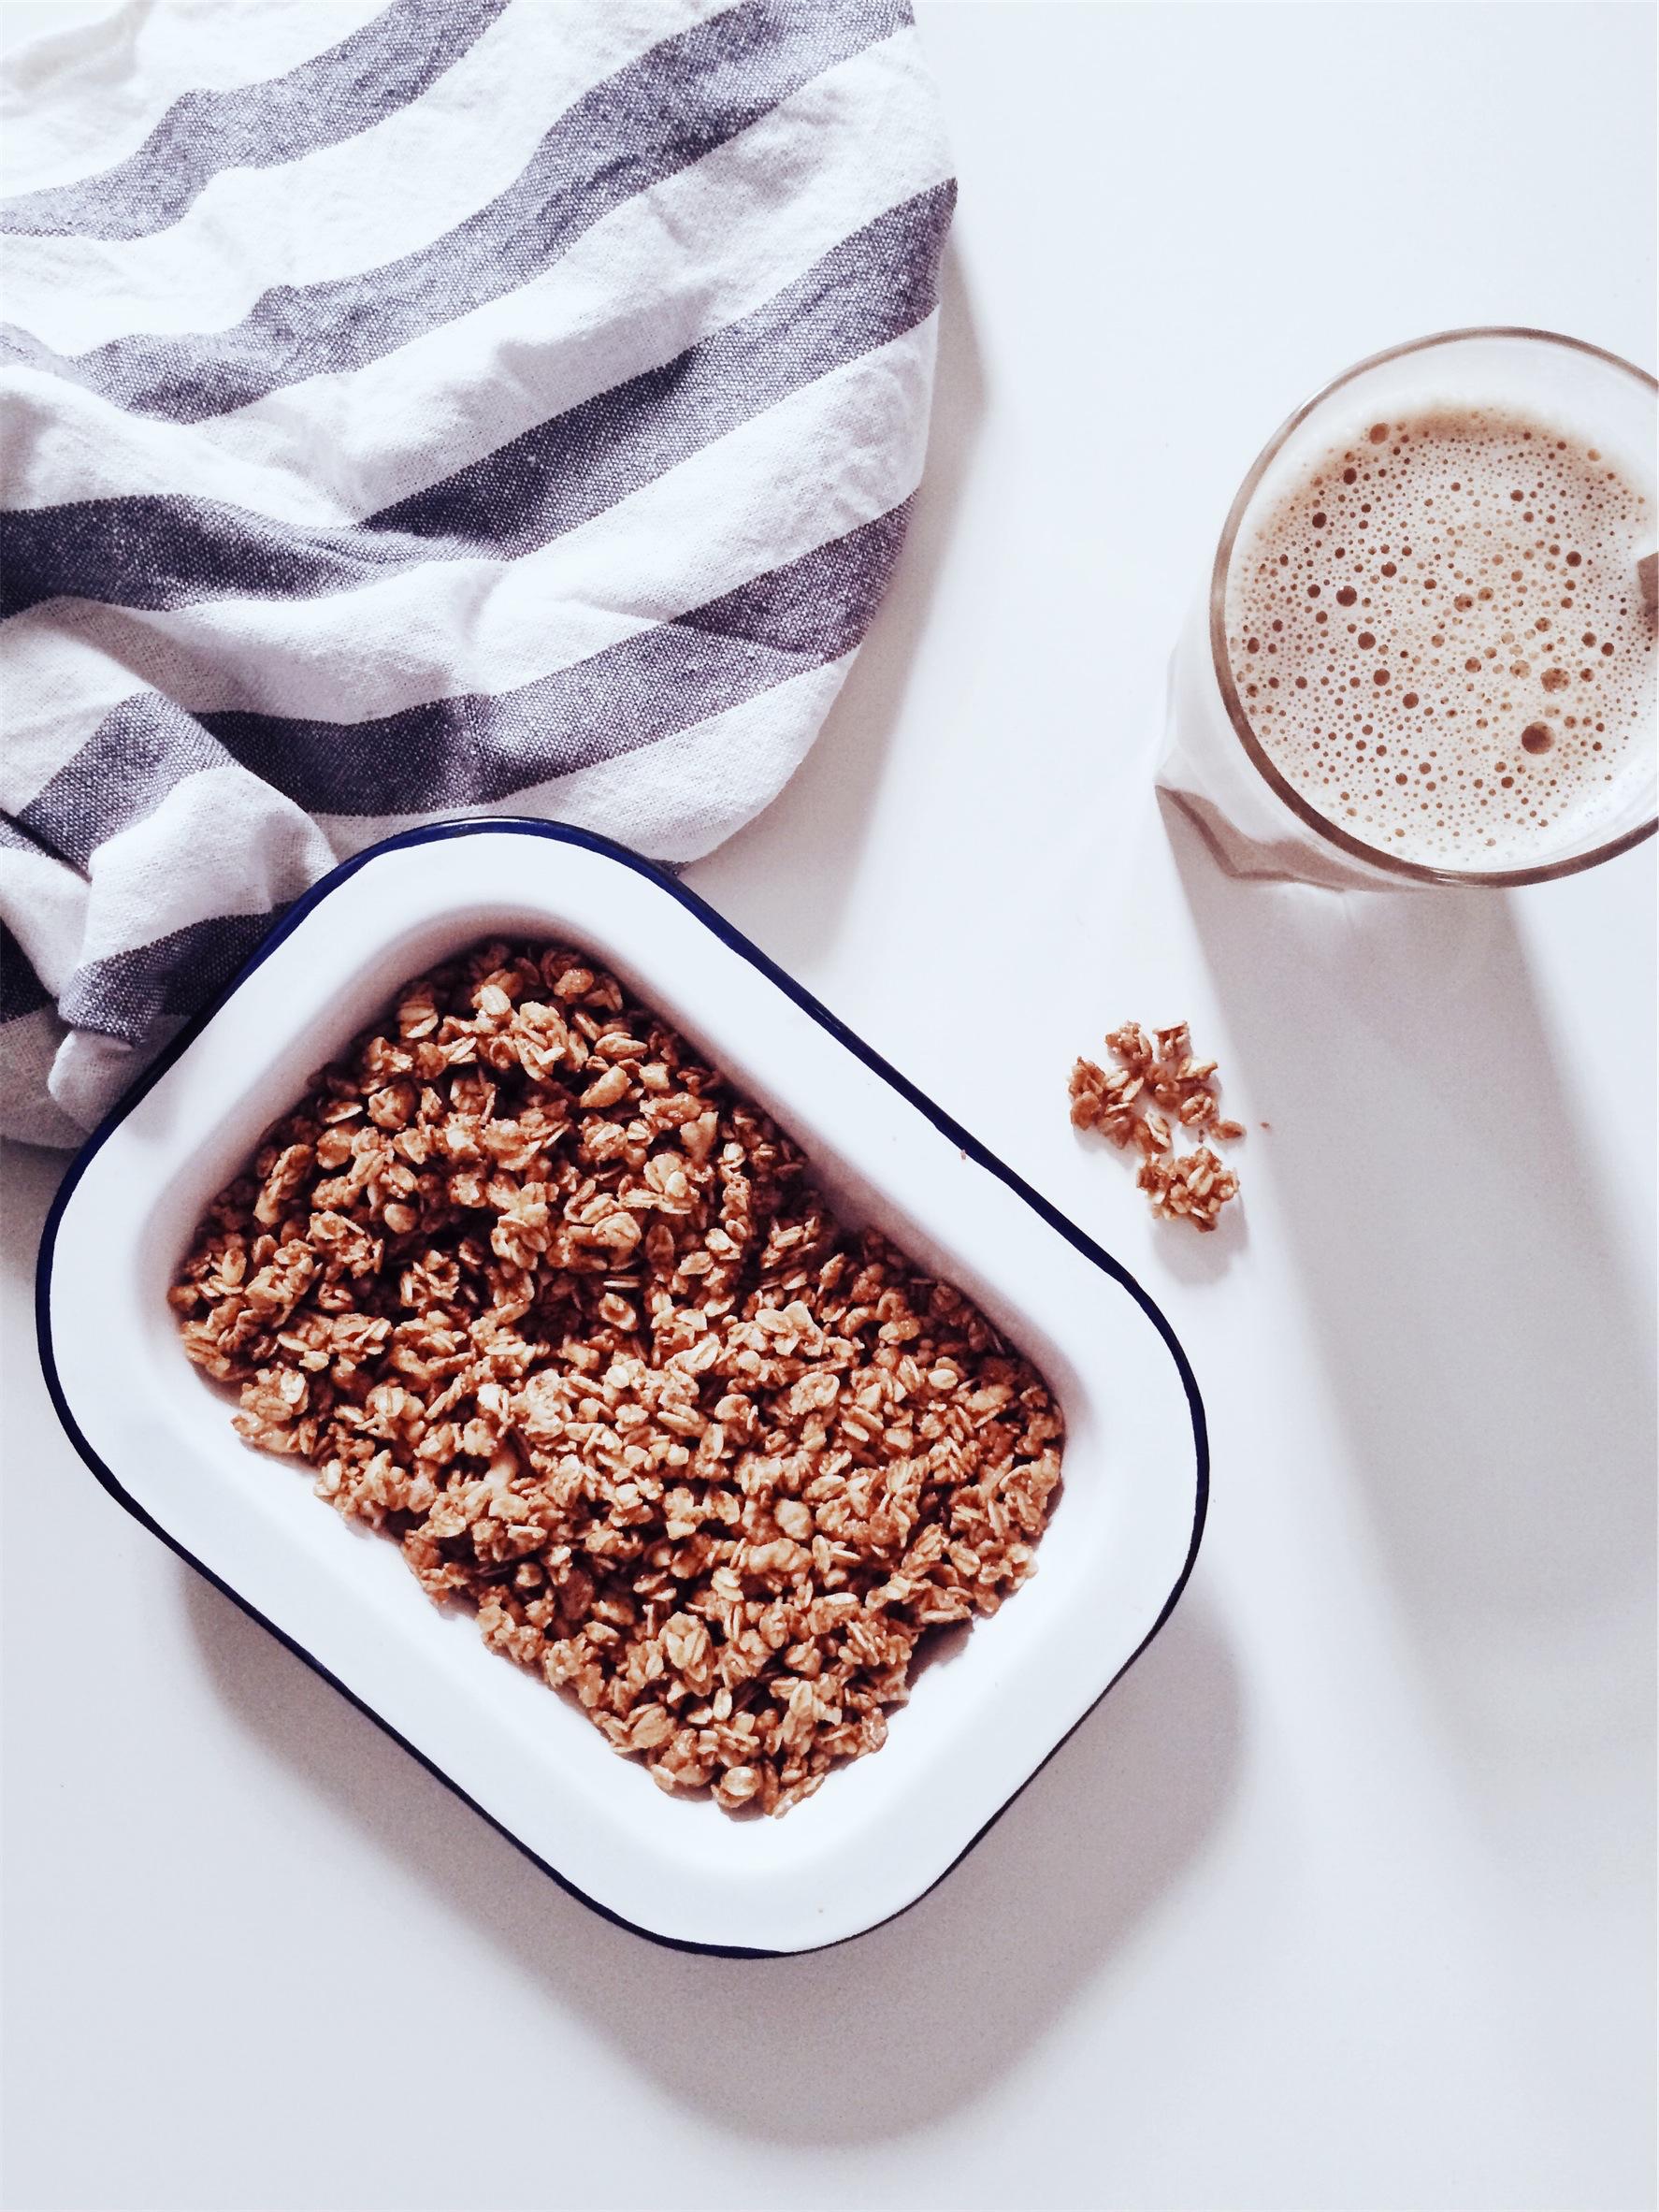 Breakfast // Overnight Oats